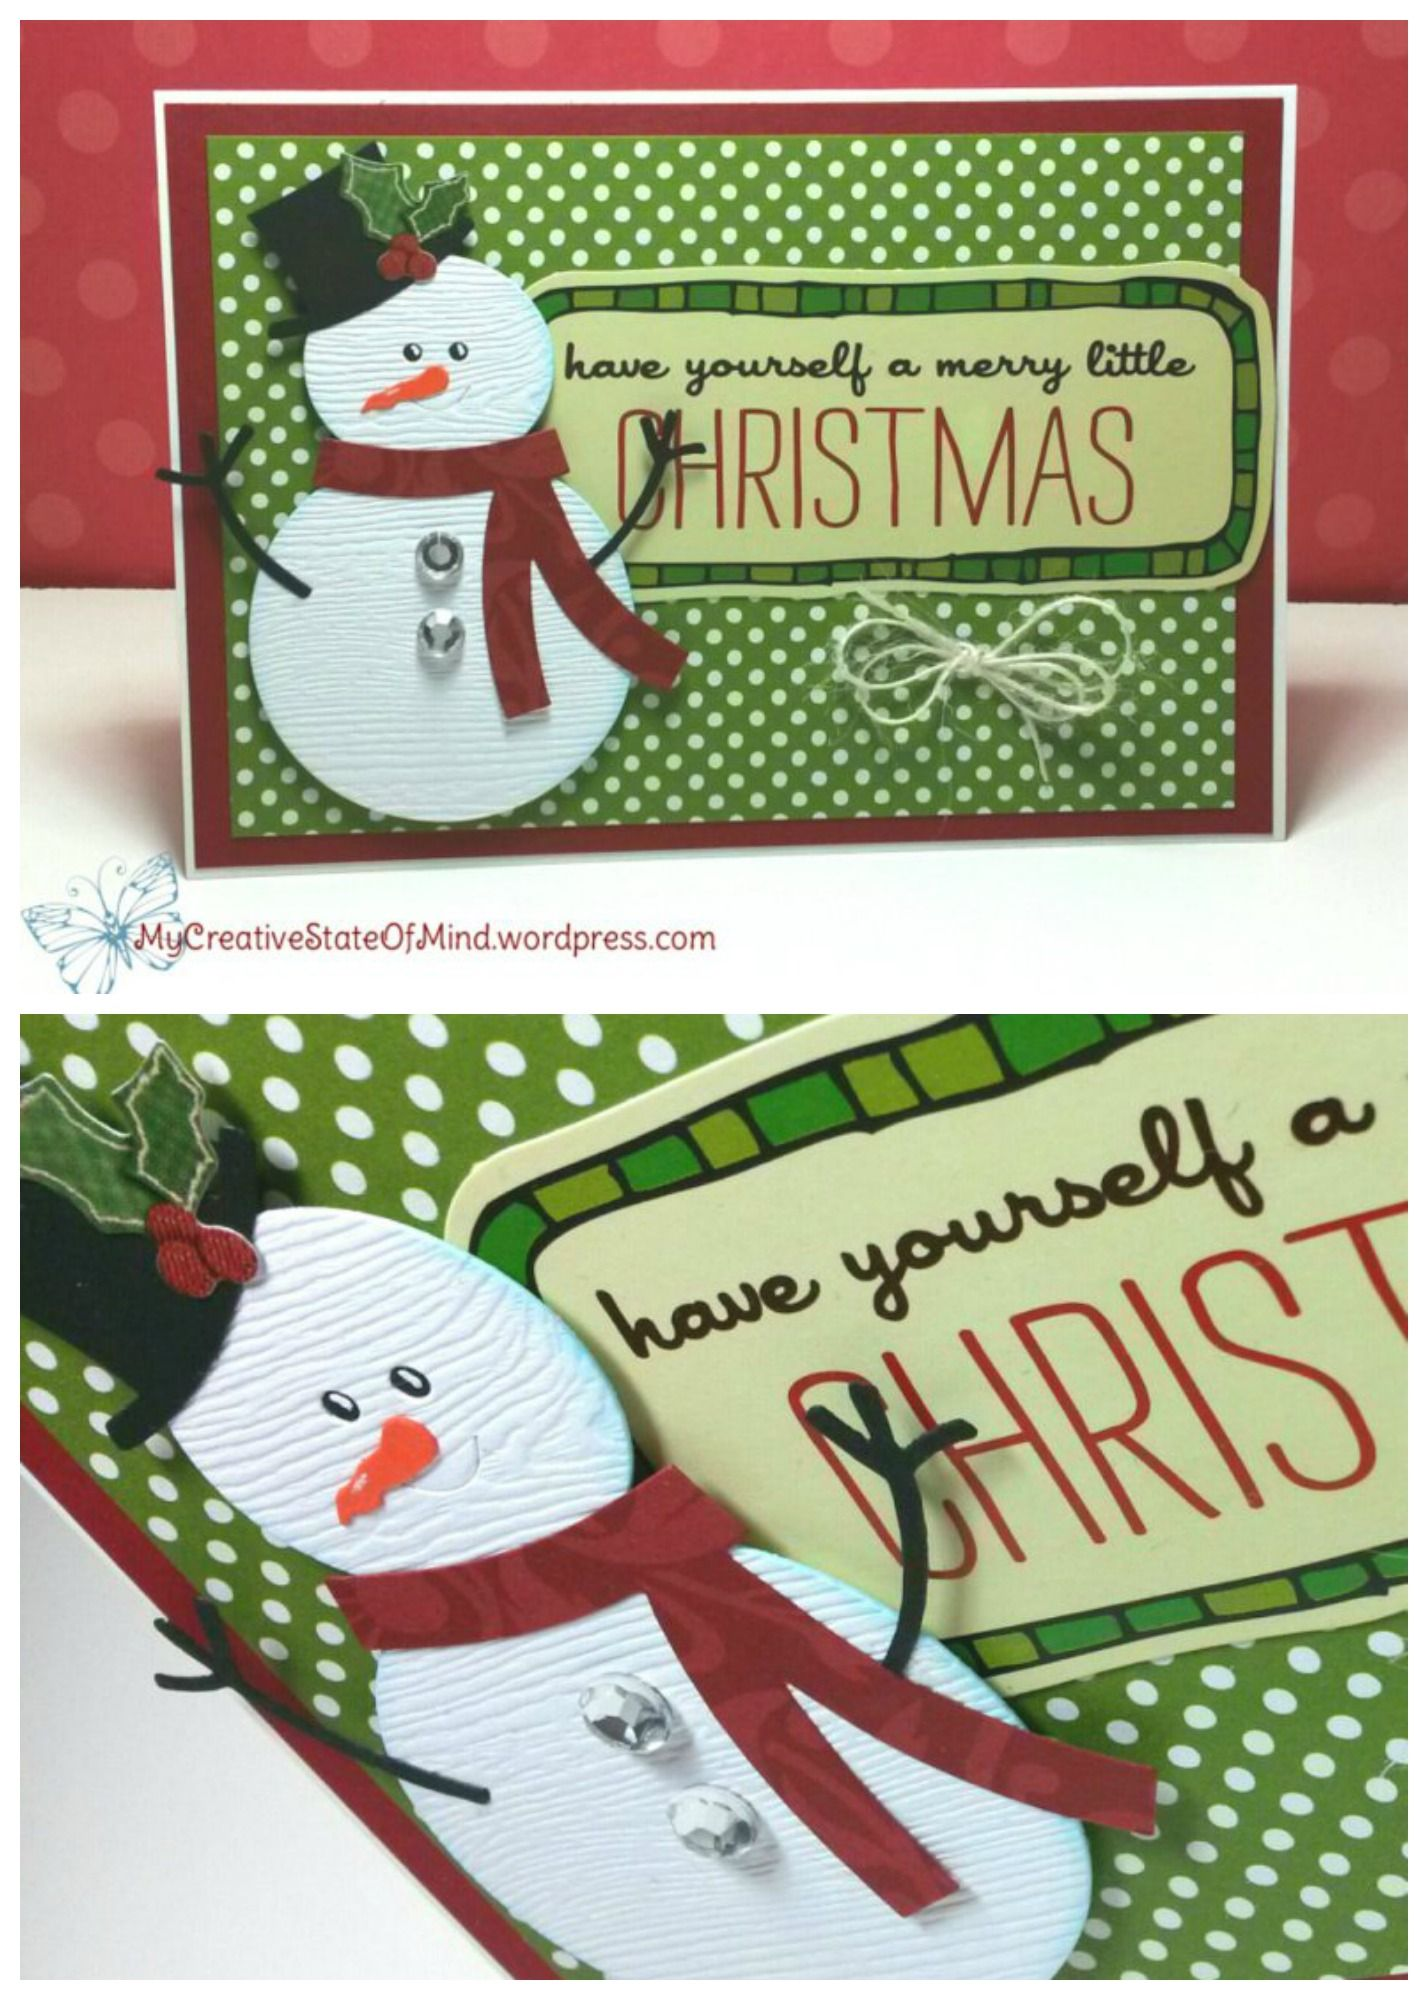 Christmas Rewind Christmas snowman, Christmas, Merry